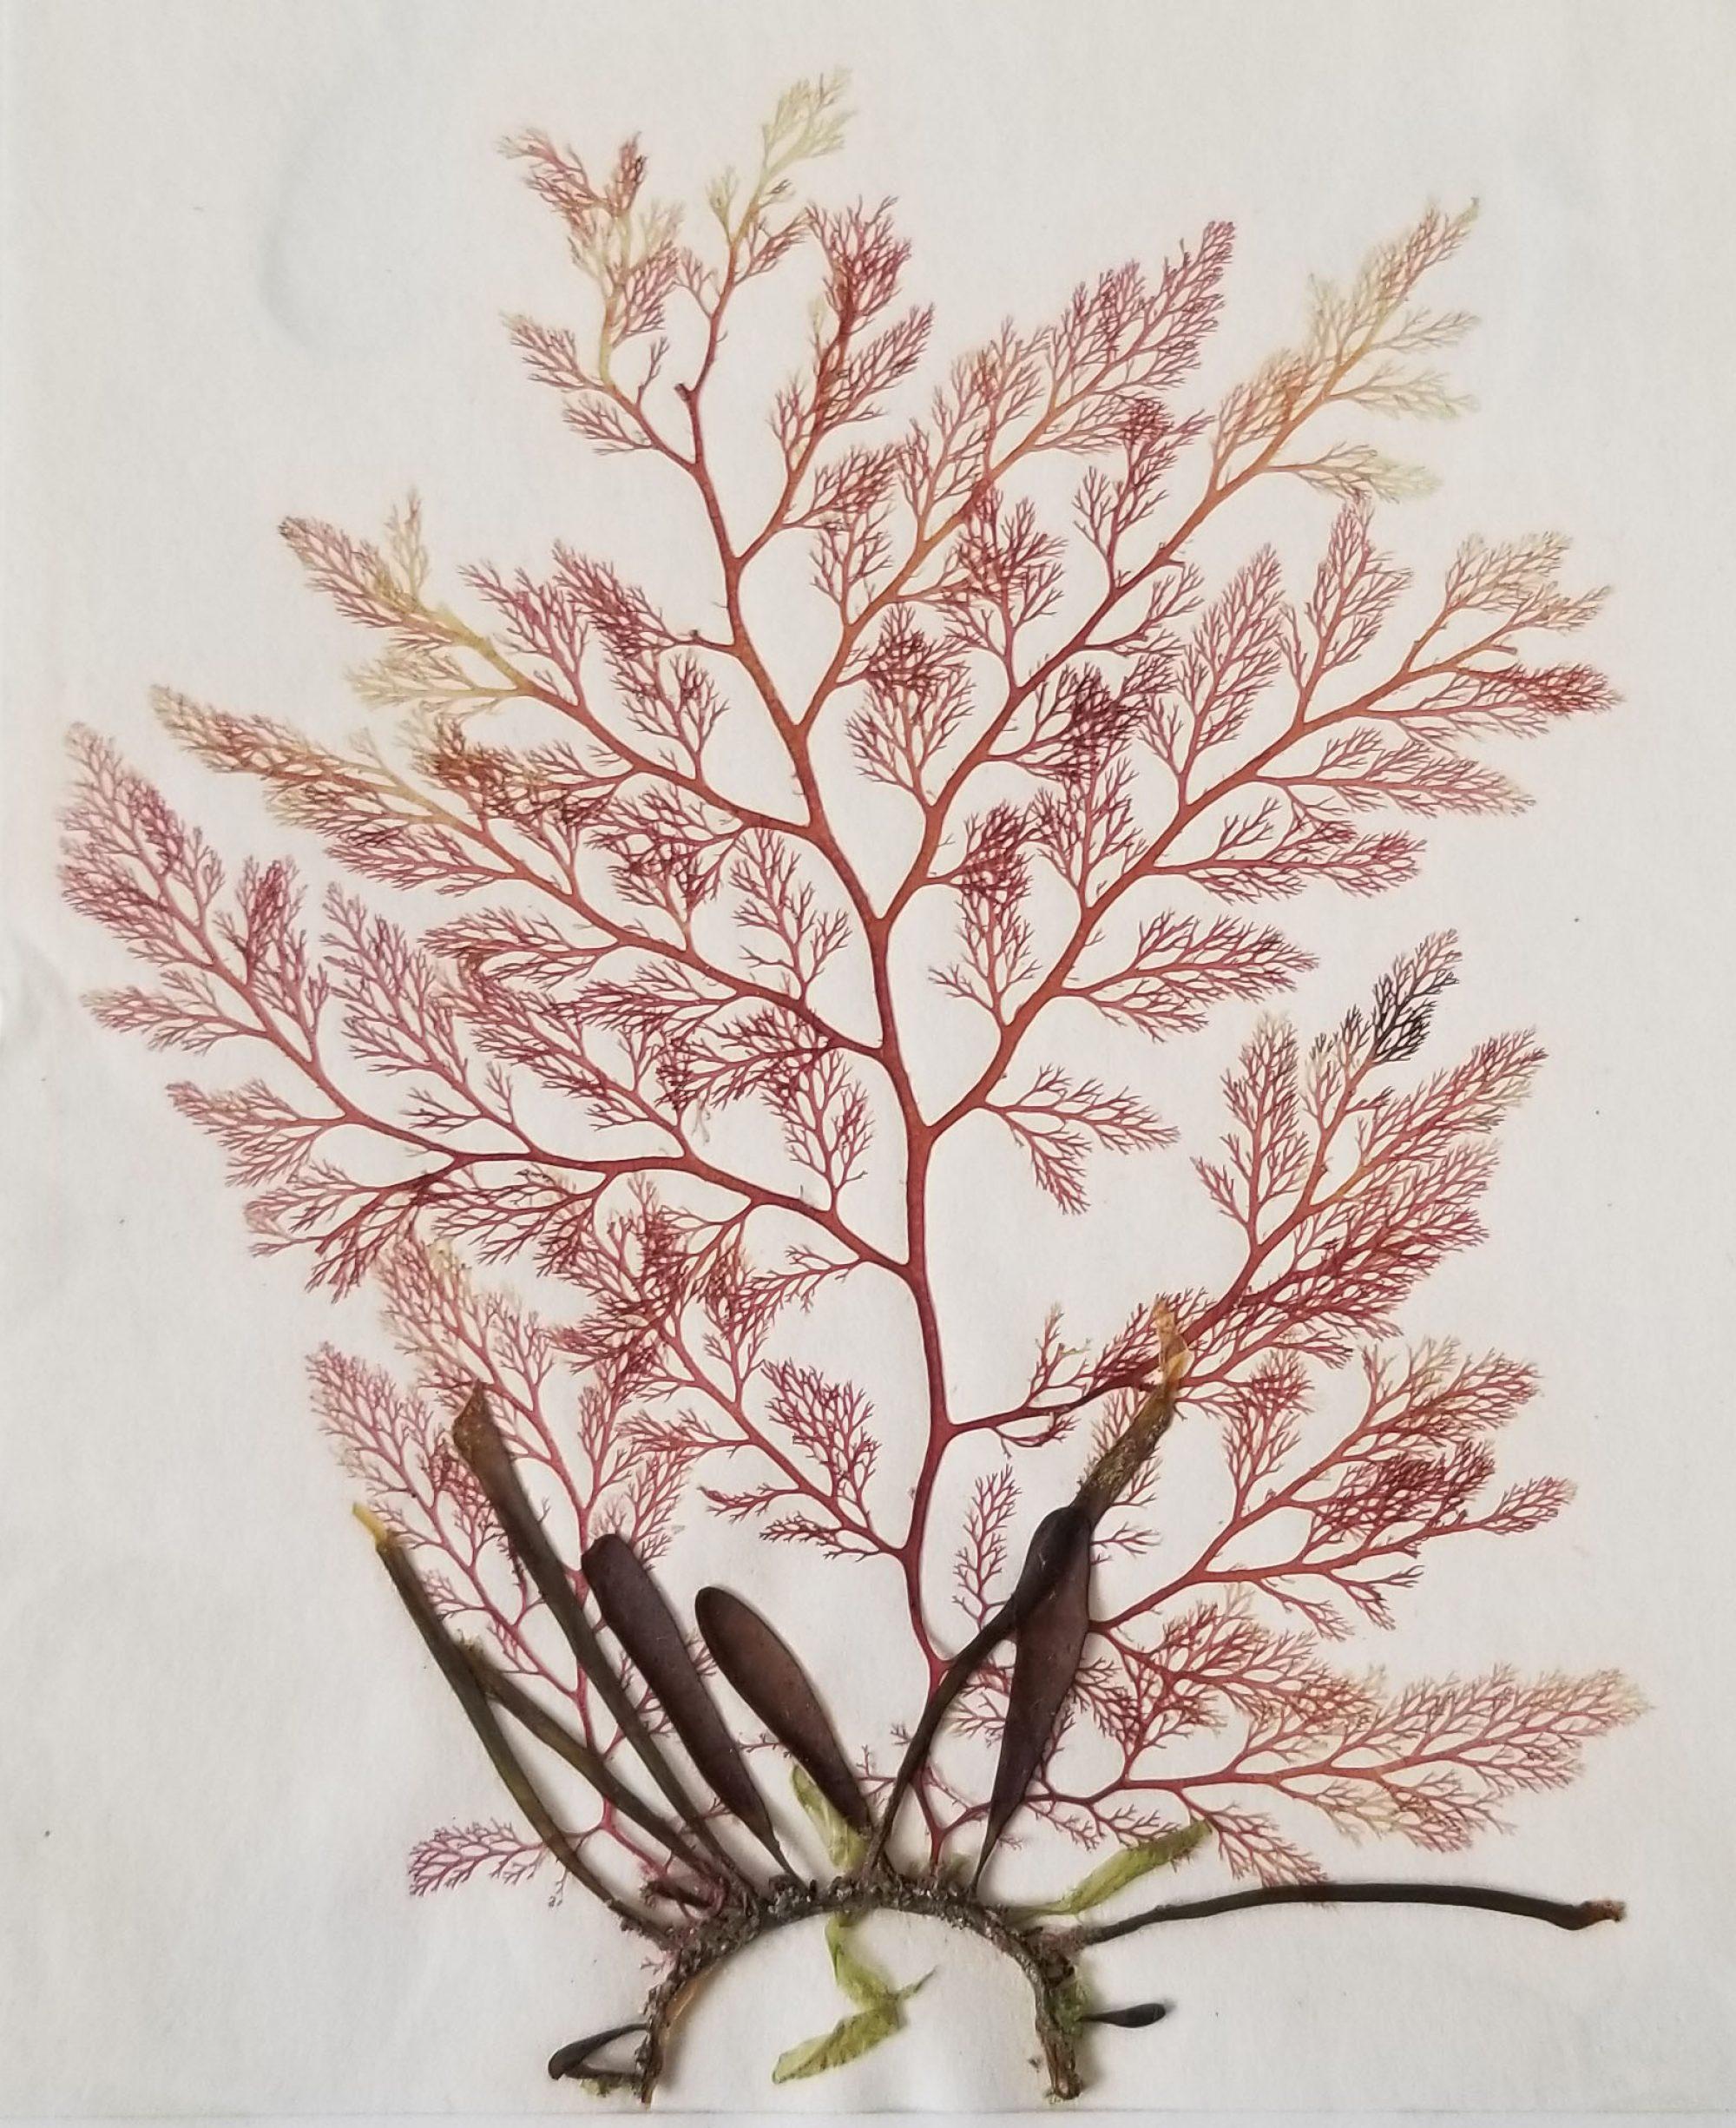 University of Illinois Herbarium